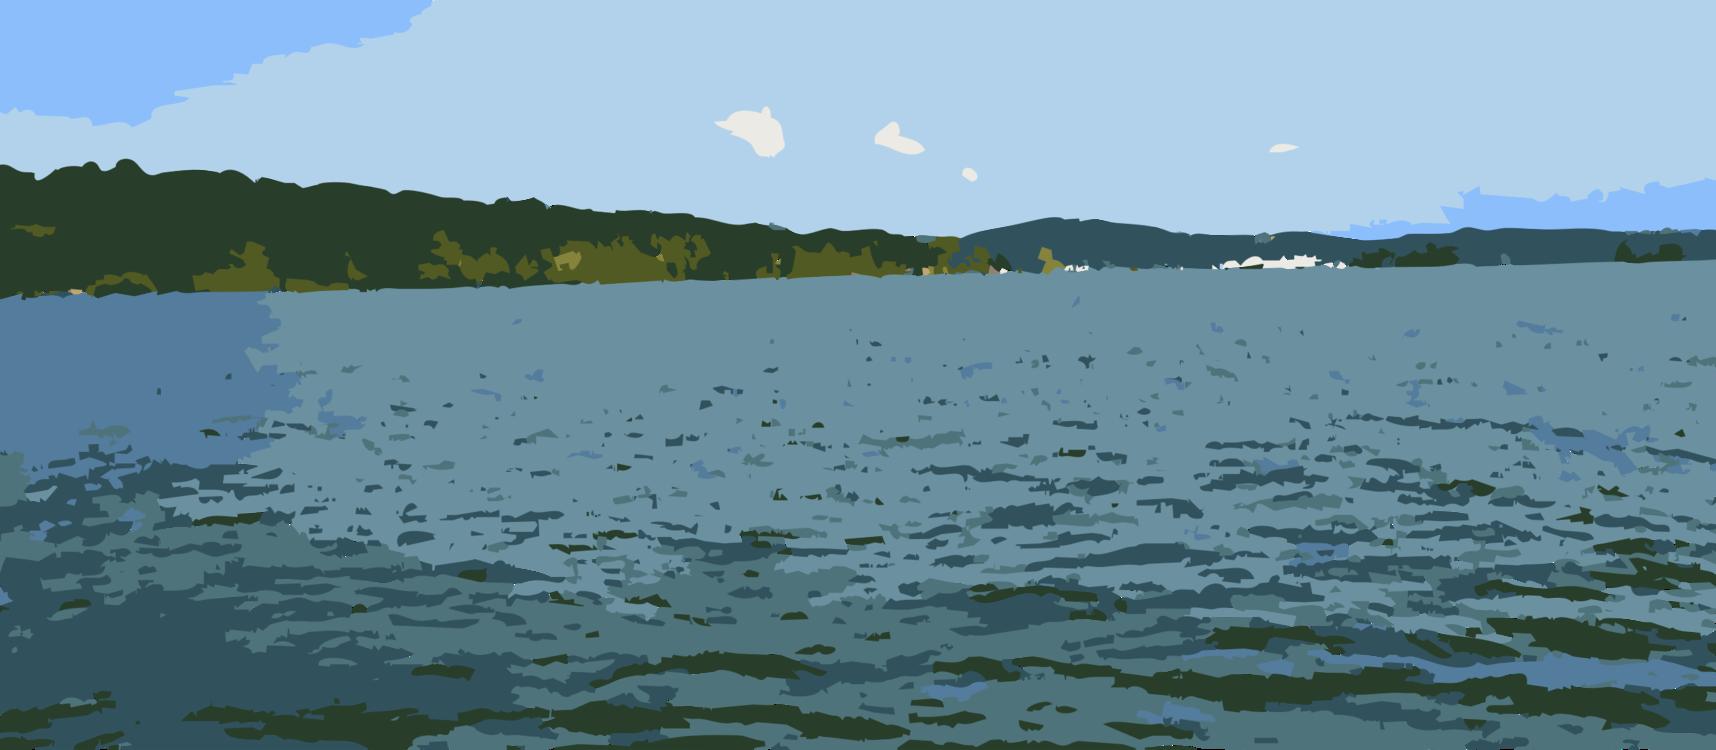 Reservoir,Loch,Wetland